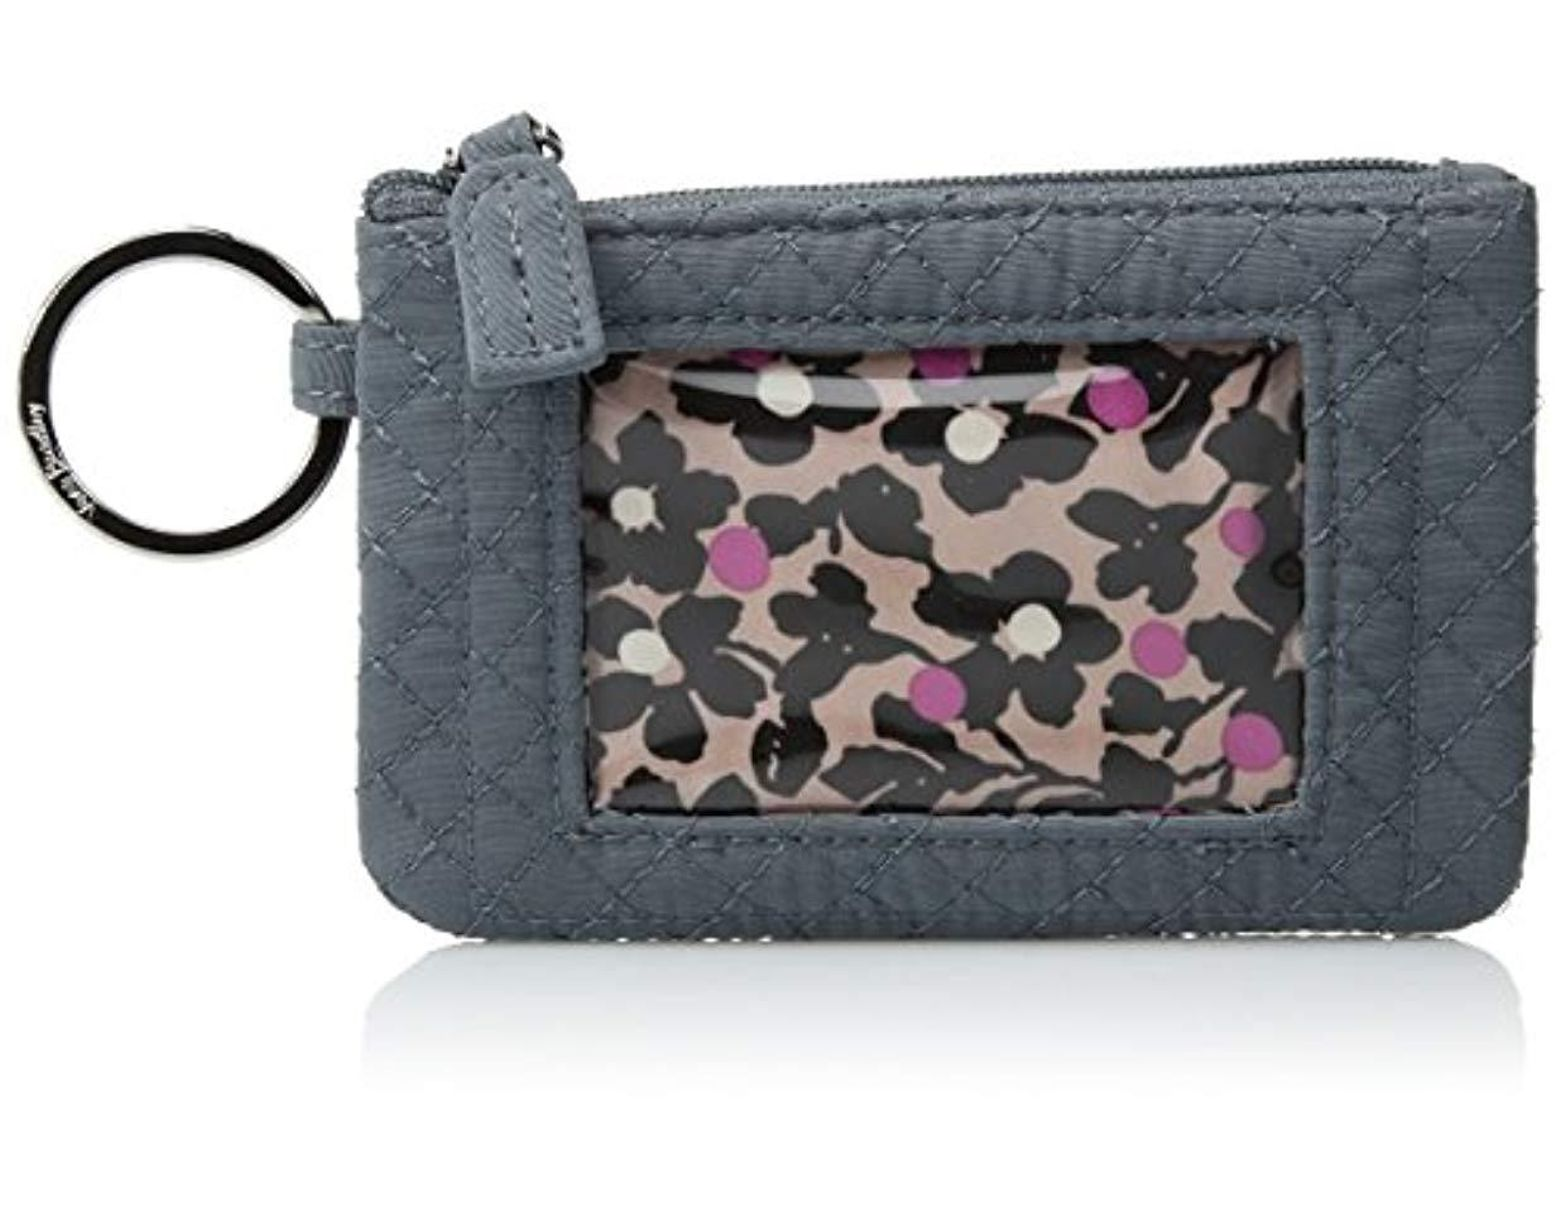 sale retailer cc56b 5f4c3 Women's Gray Iconic Zip Id Case, Microfiber